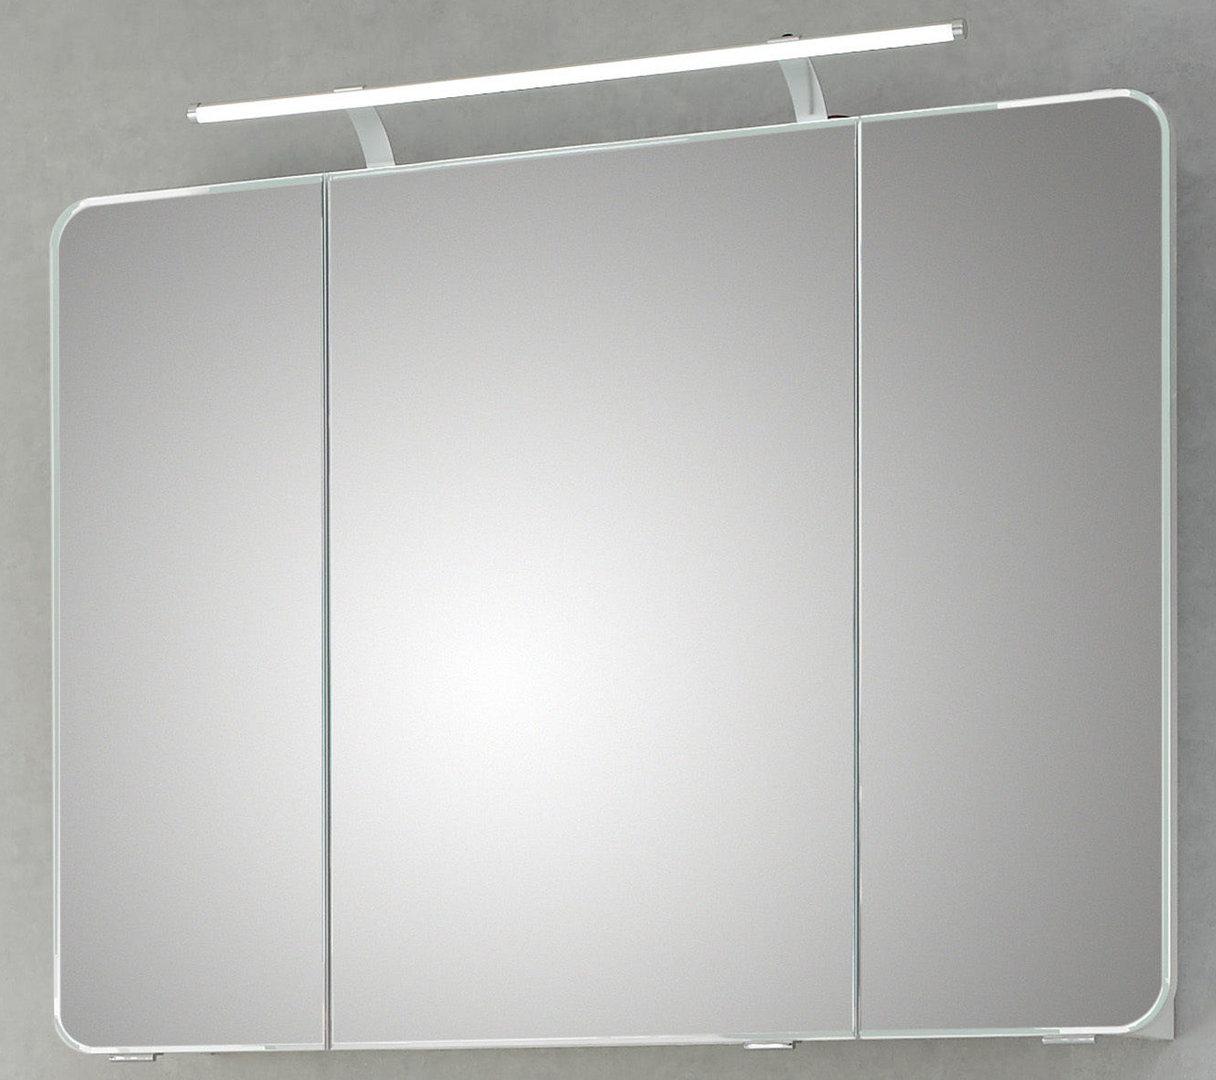 pelipal spiegelschrank focus 4005 led wei hochglanz 90x72 cm. Black Bedroom Furniture Sets. Home Design Ideas